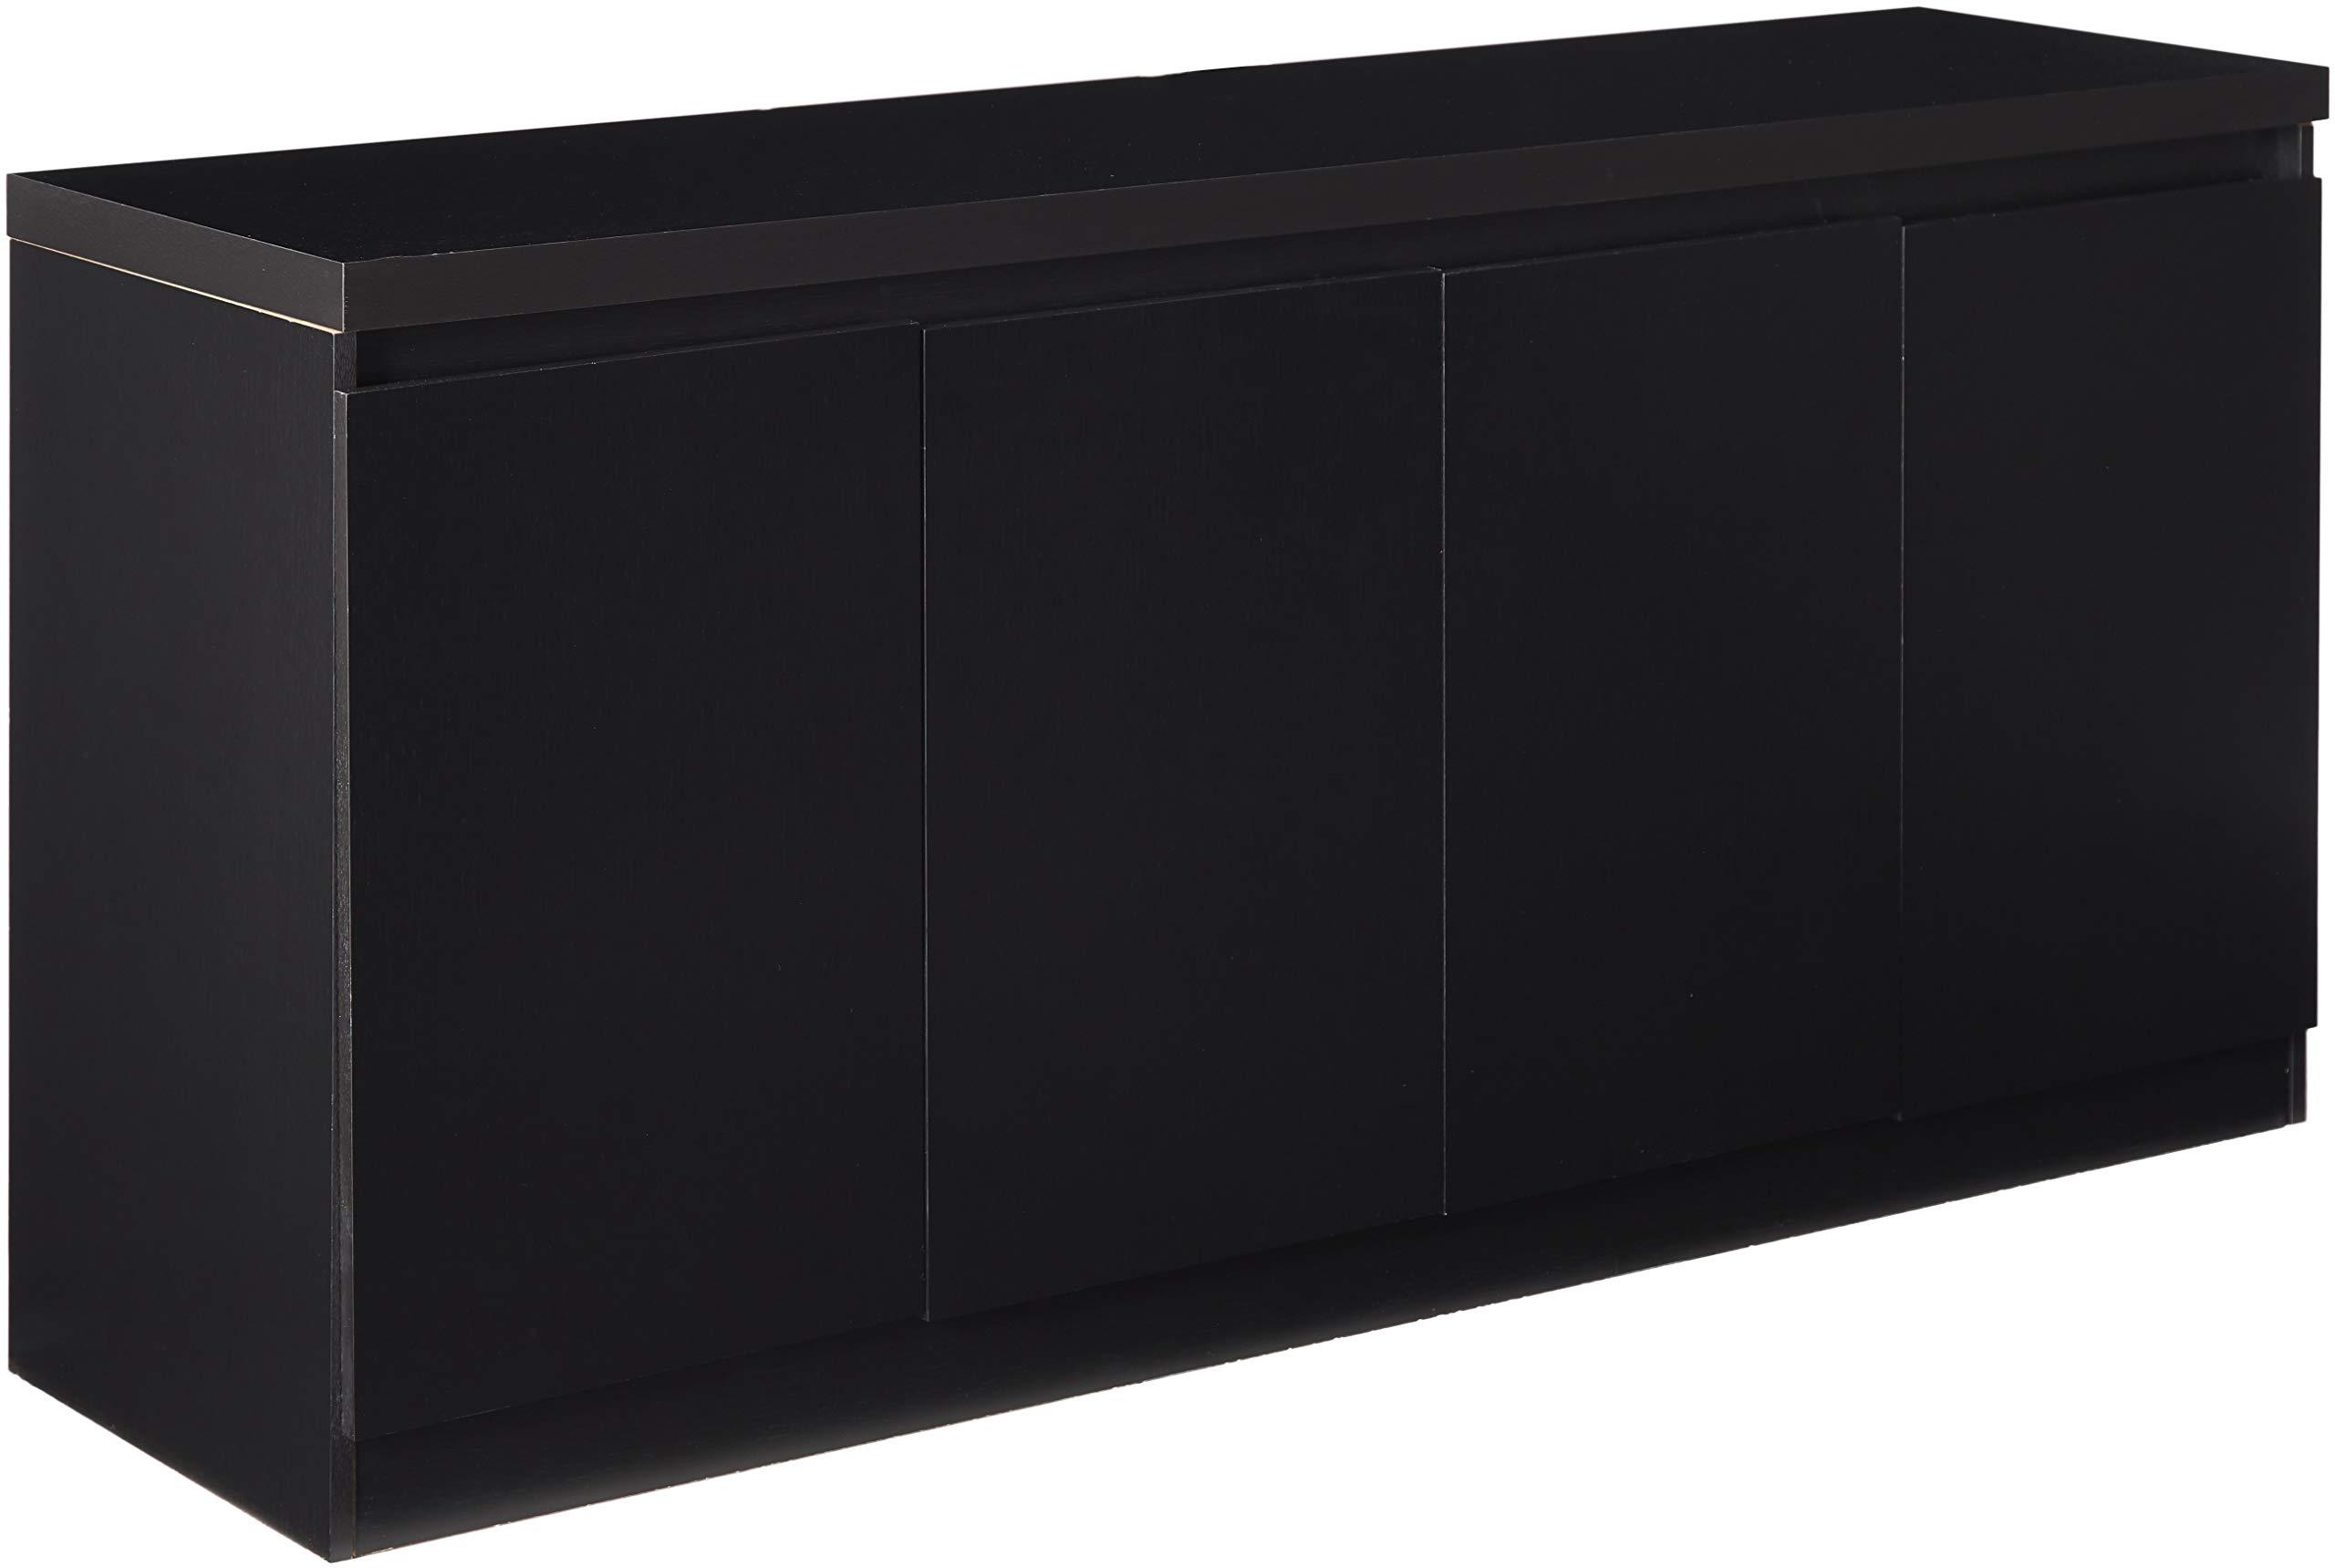 Manhattan Comforts 100653-MC Viennese Sideboard Black Matte by Manhattan Comforts (Image #1)